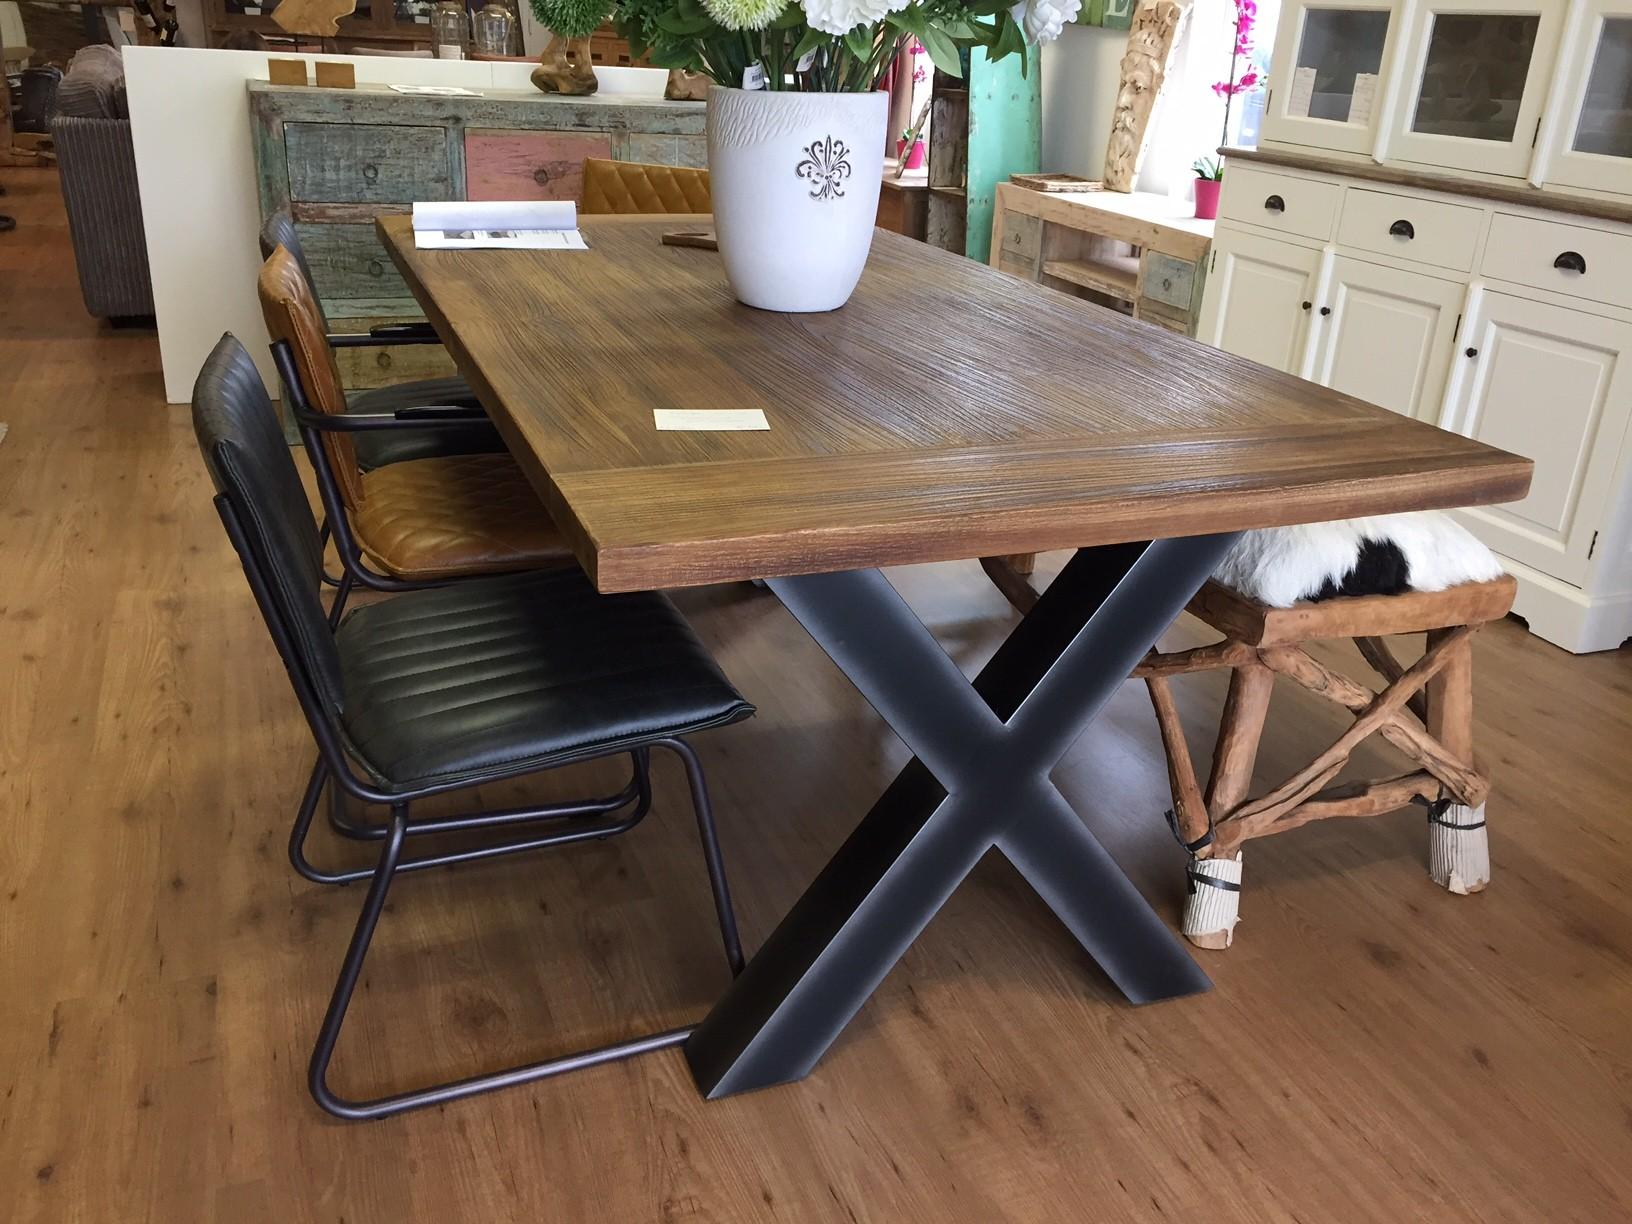 Teak Tafels Haarlem : Teak eettafel met stalen kruis poot